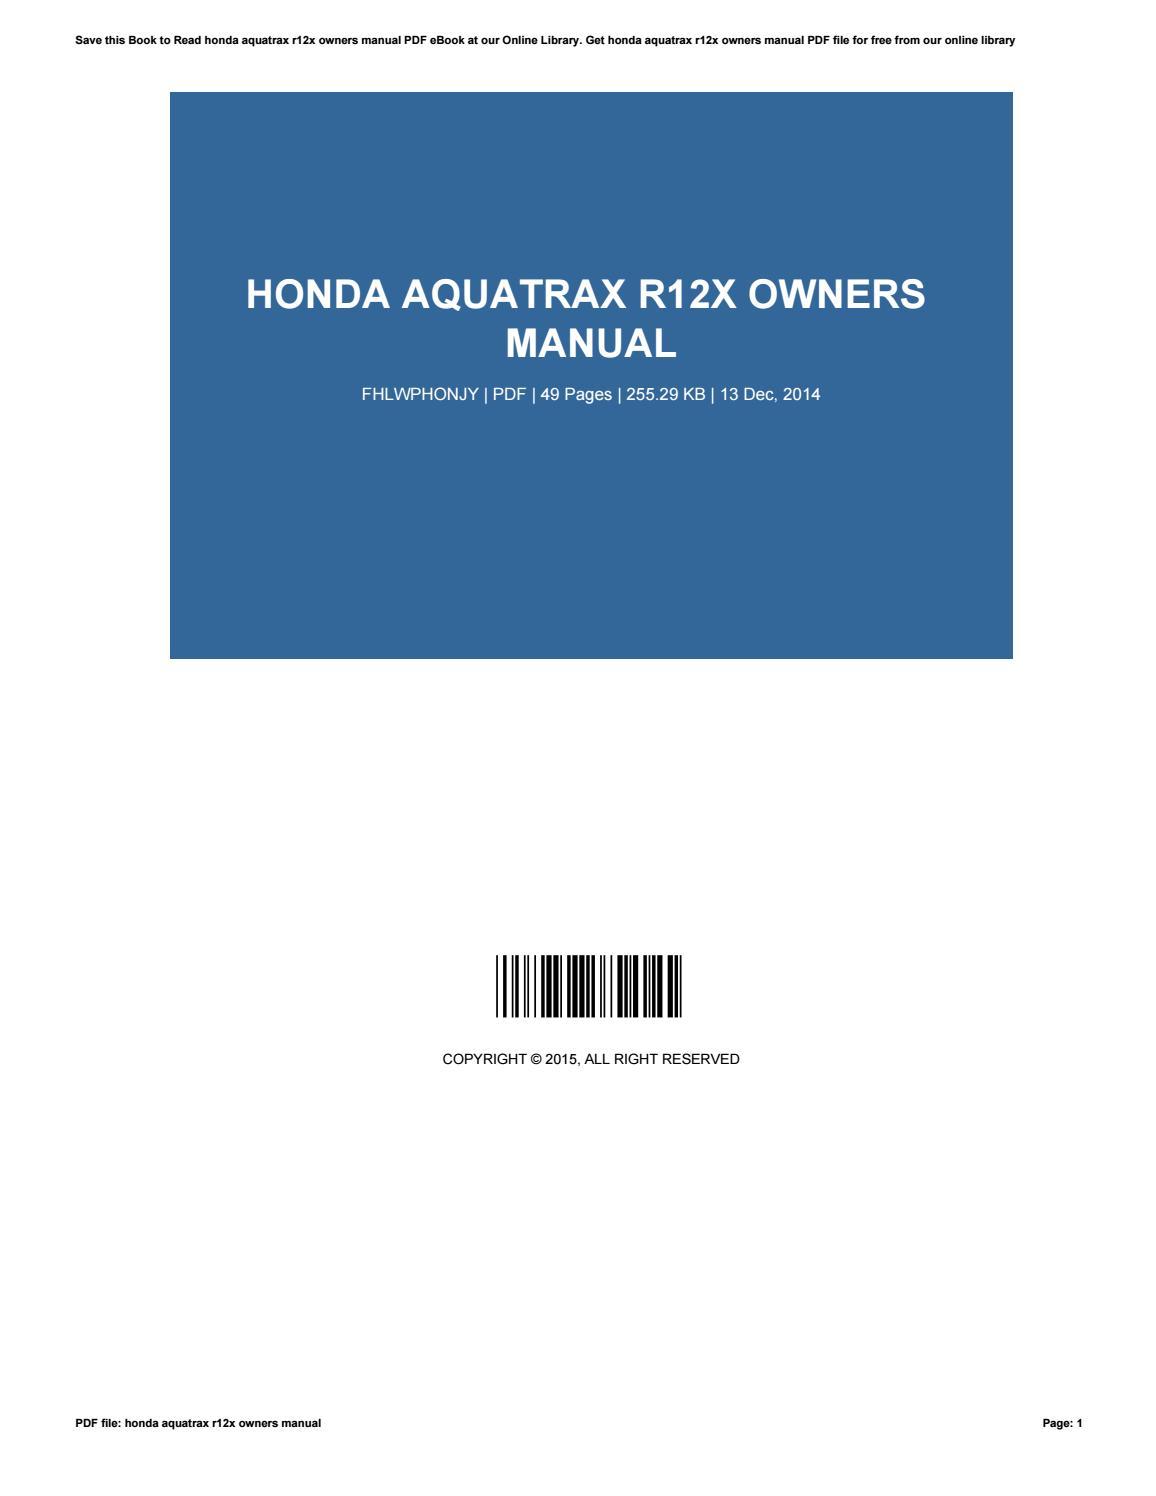 honda aquatrax r12x owners manual by phillipelmore3769 issuu rh issuu com Manual Book Owner's Manual